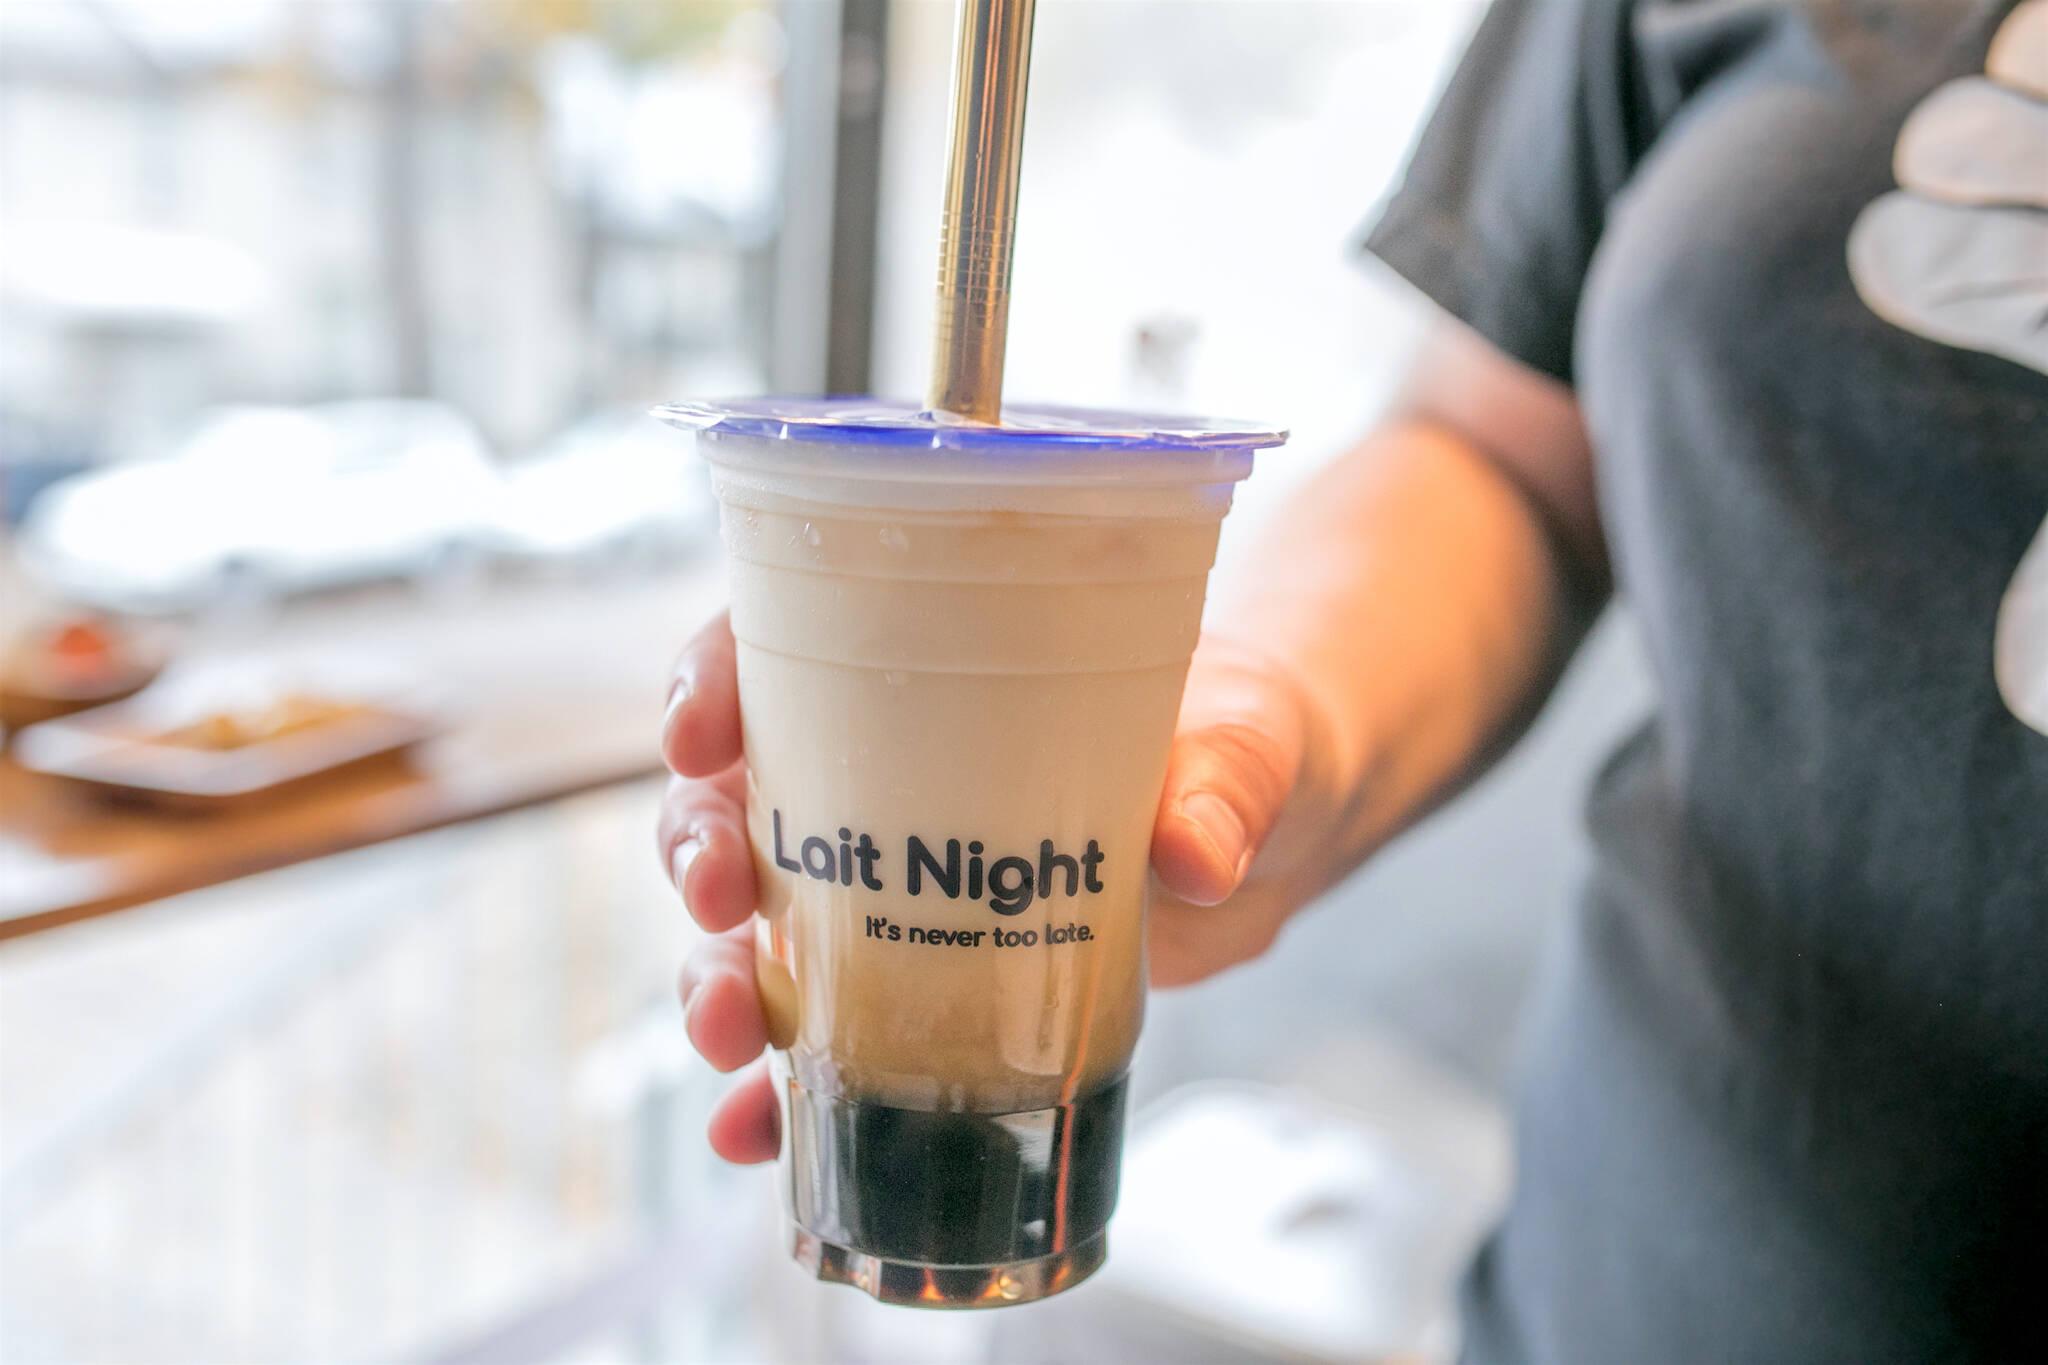 Lait Night Cafe